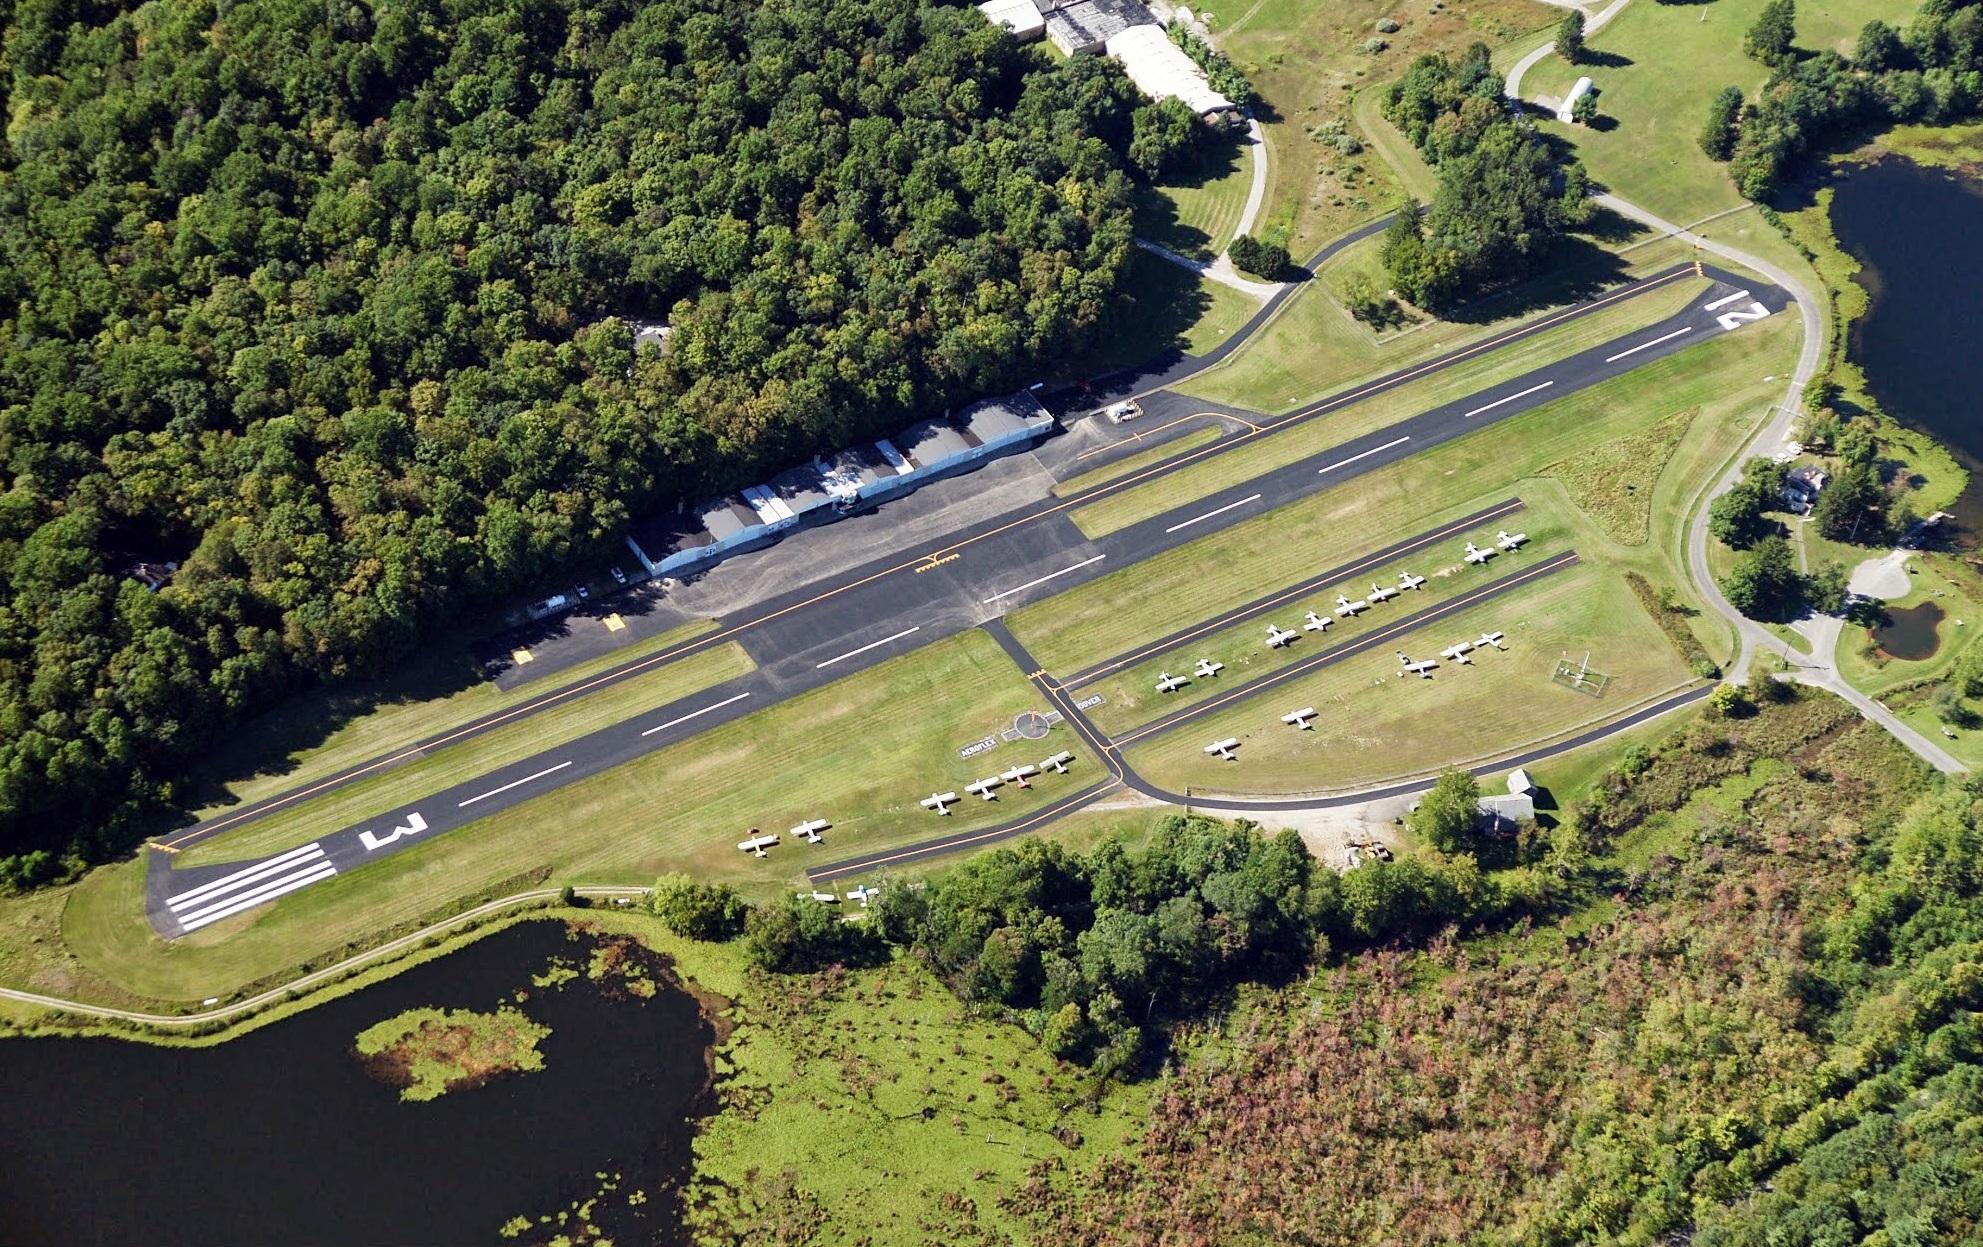 Aeroflex-Andover Airport